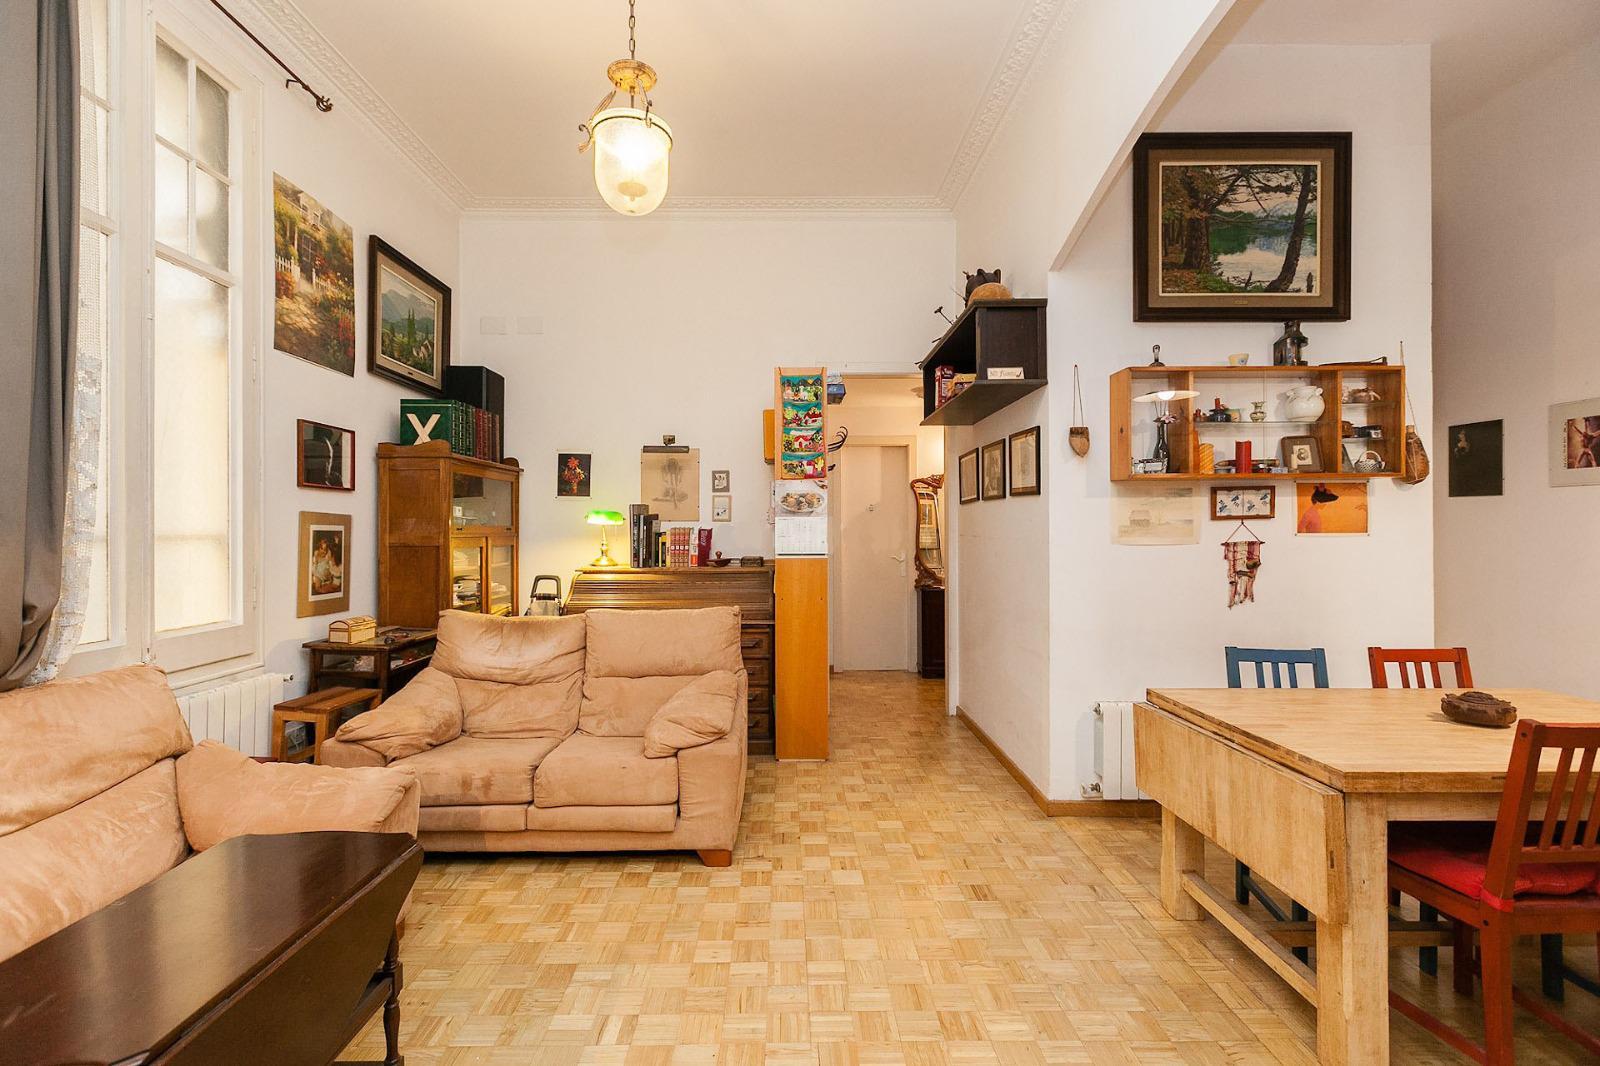 247916 Flat for sale in Sarrià-Sant Gervasi, Sant Gervasi-Galvany 10